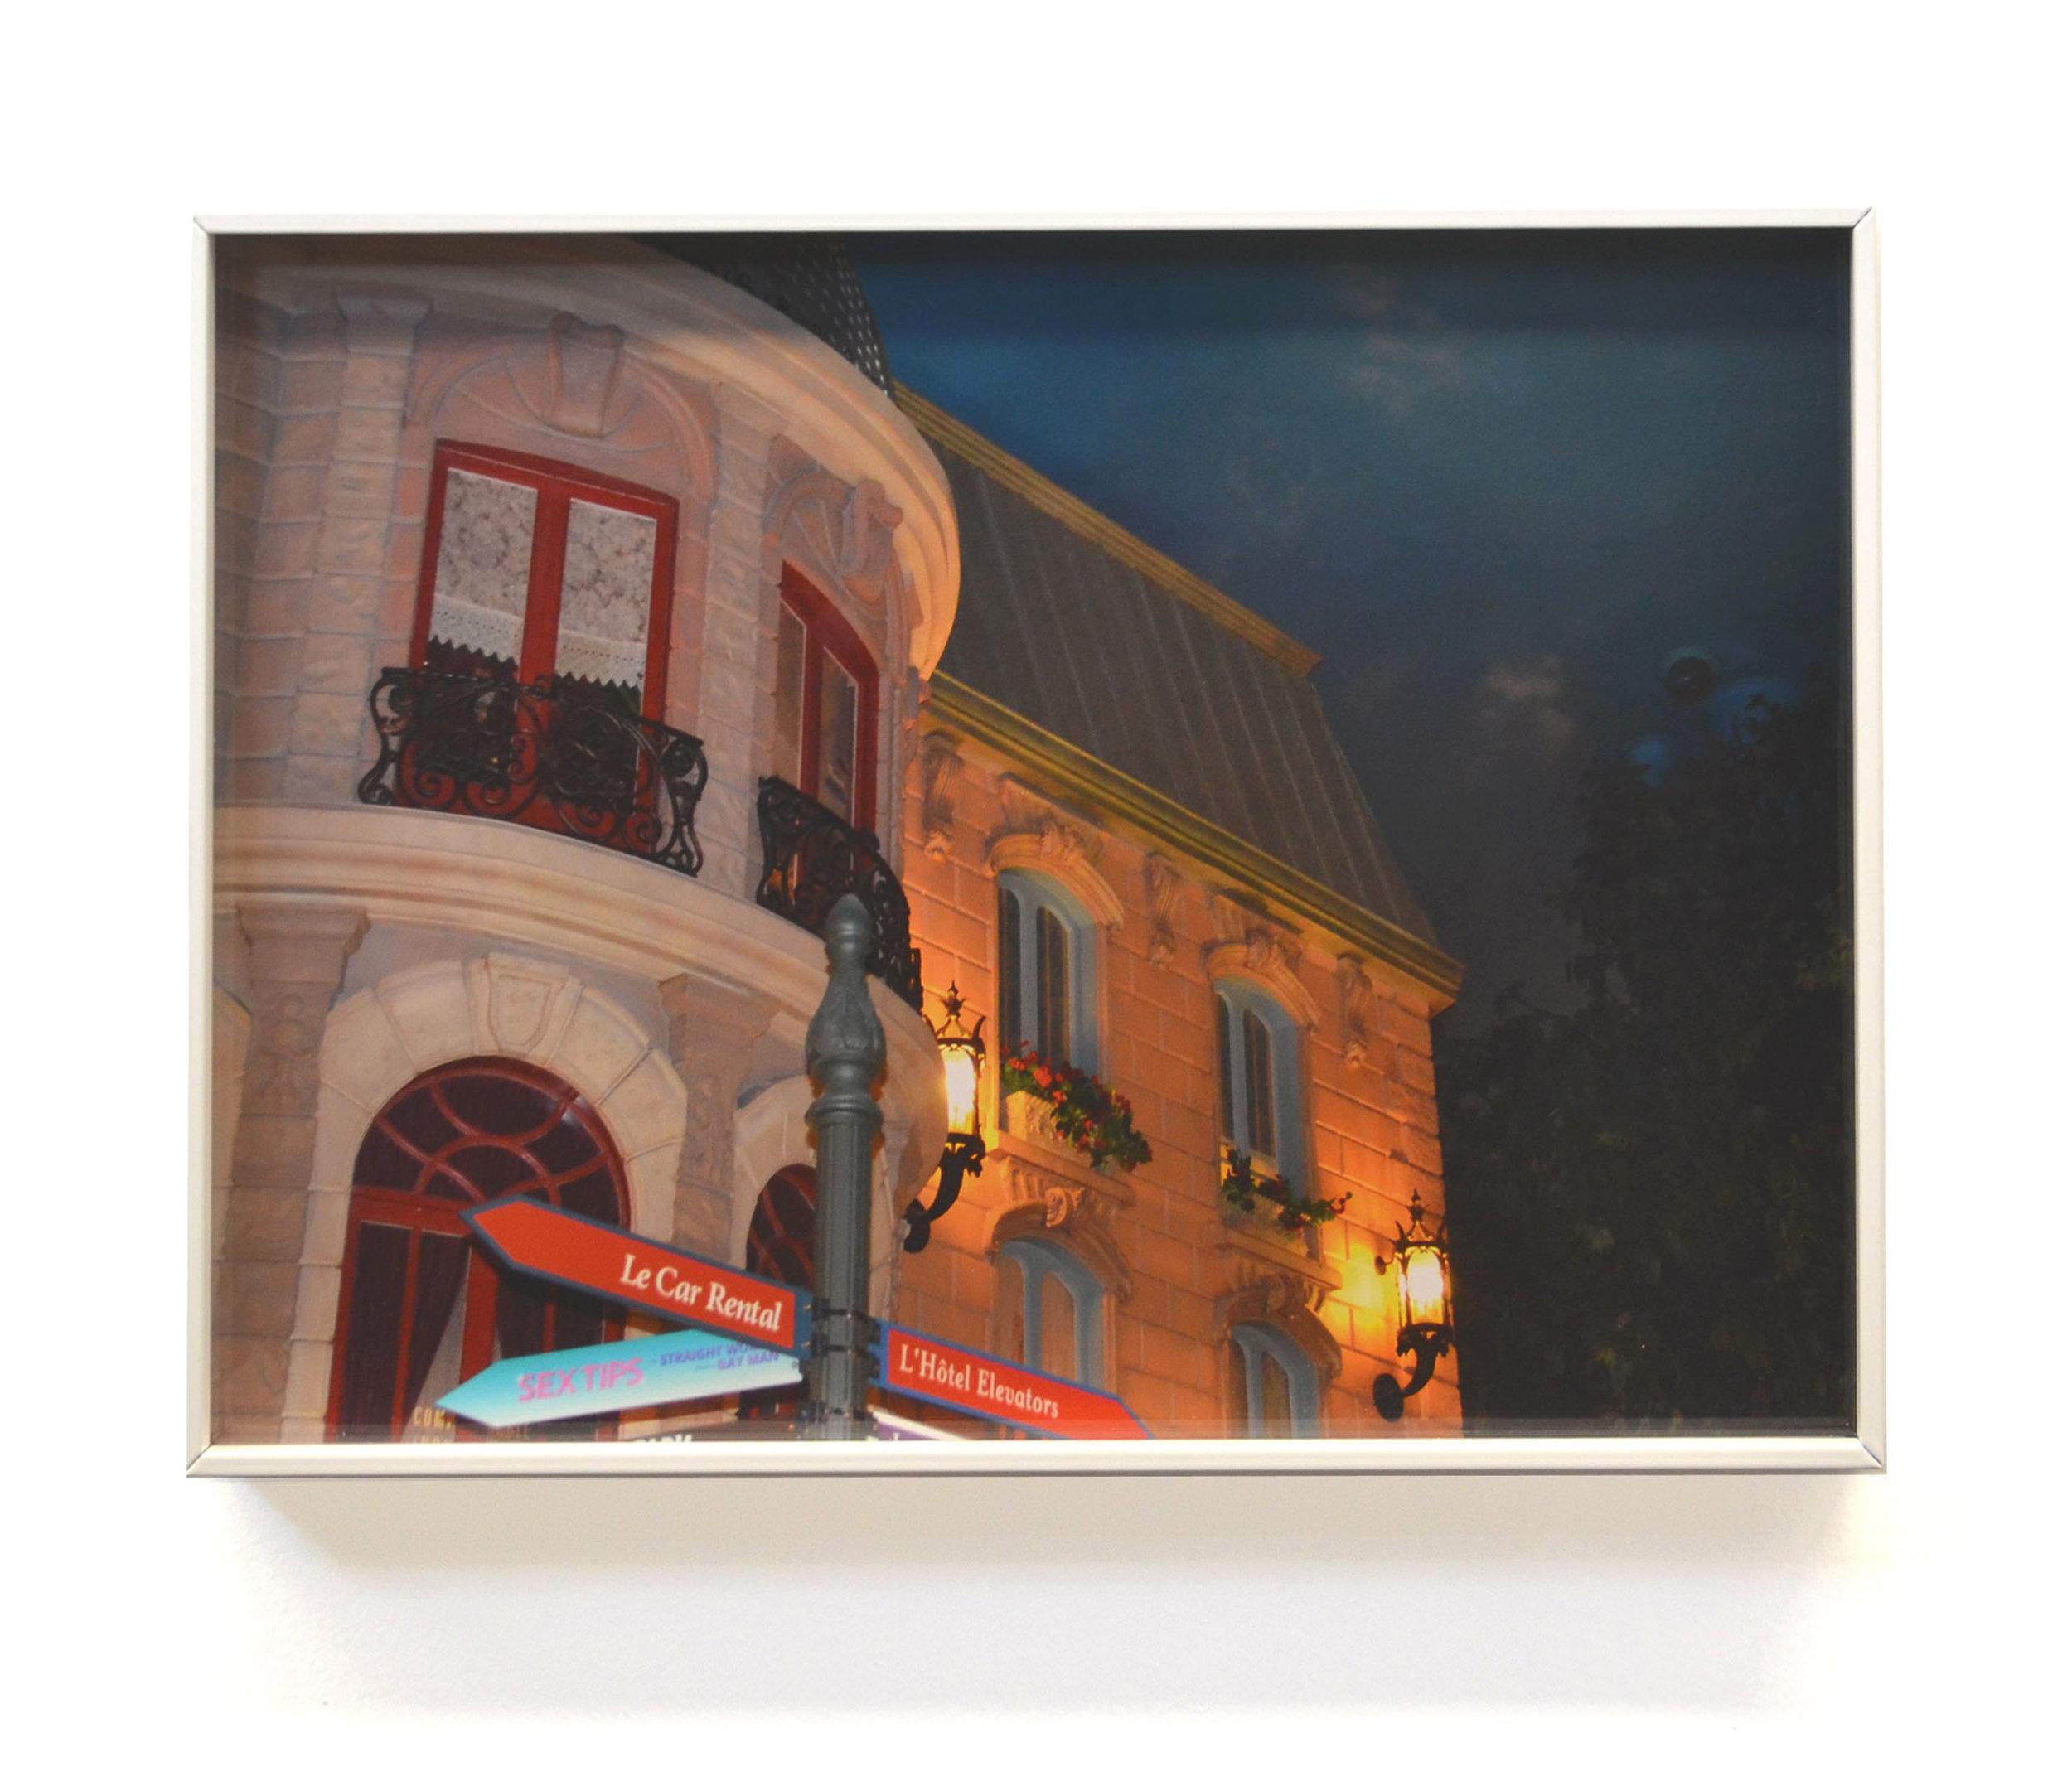 Megan Plunkett, Woman, 2018, digital C-print on super glossy paper, powder coated aluminum frames, 12 × 17 in